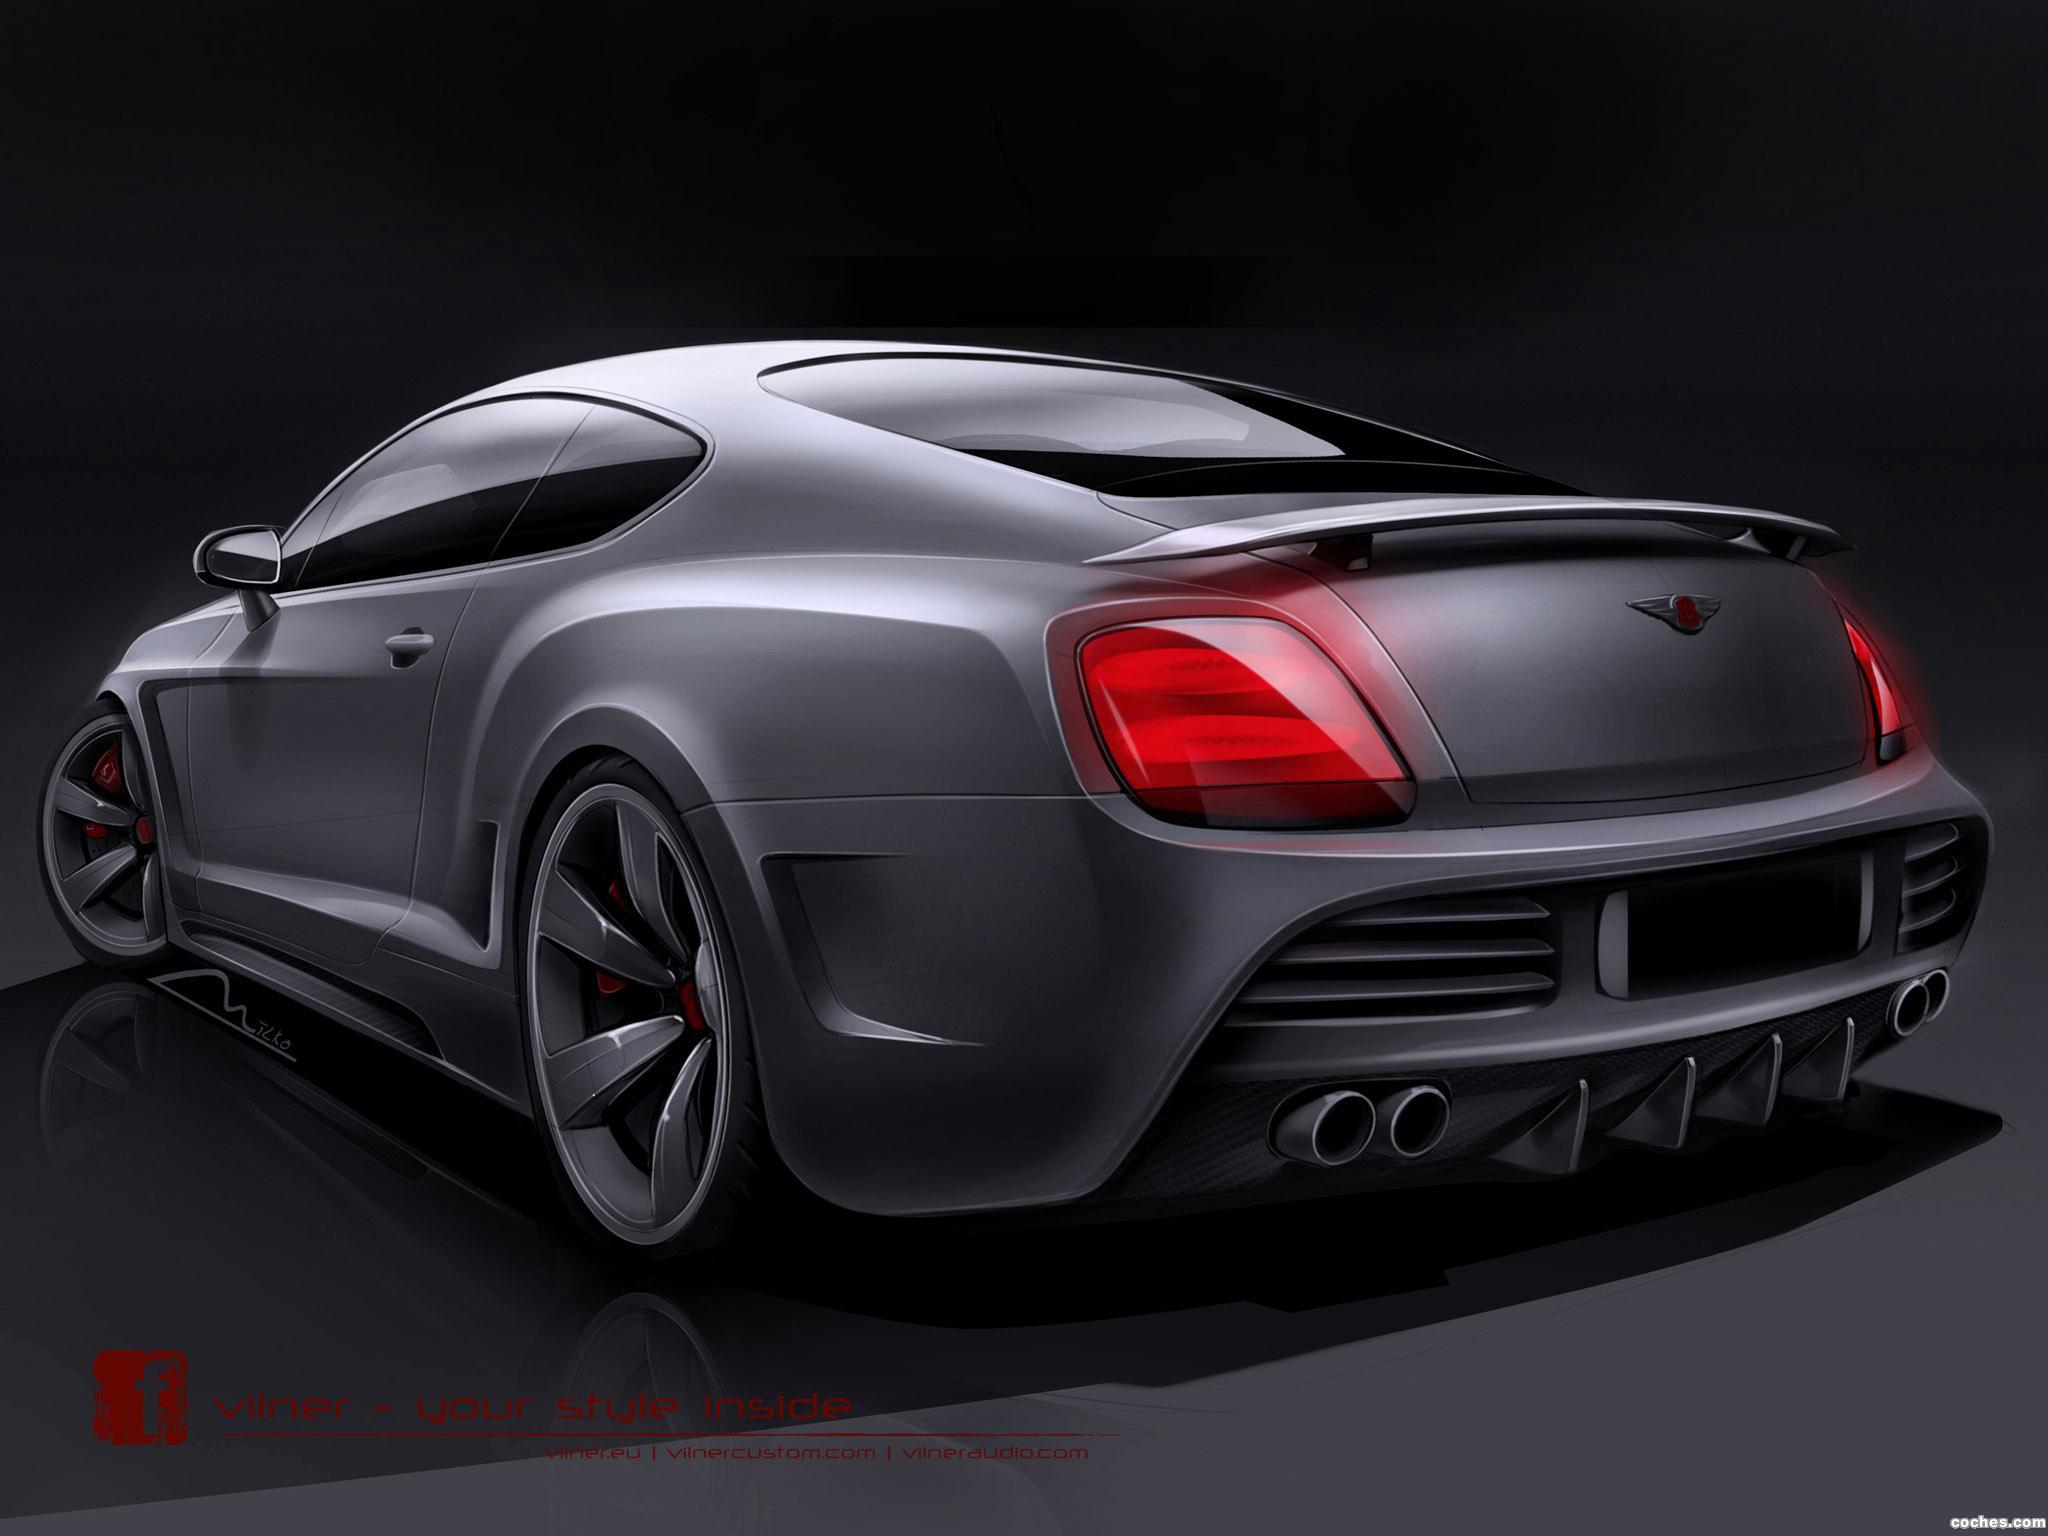 Foto 1 de Vilner Bentley Continental GT Design Project 2013